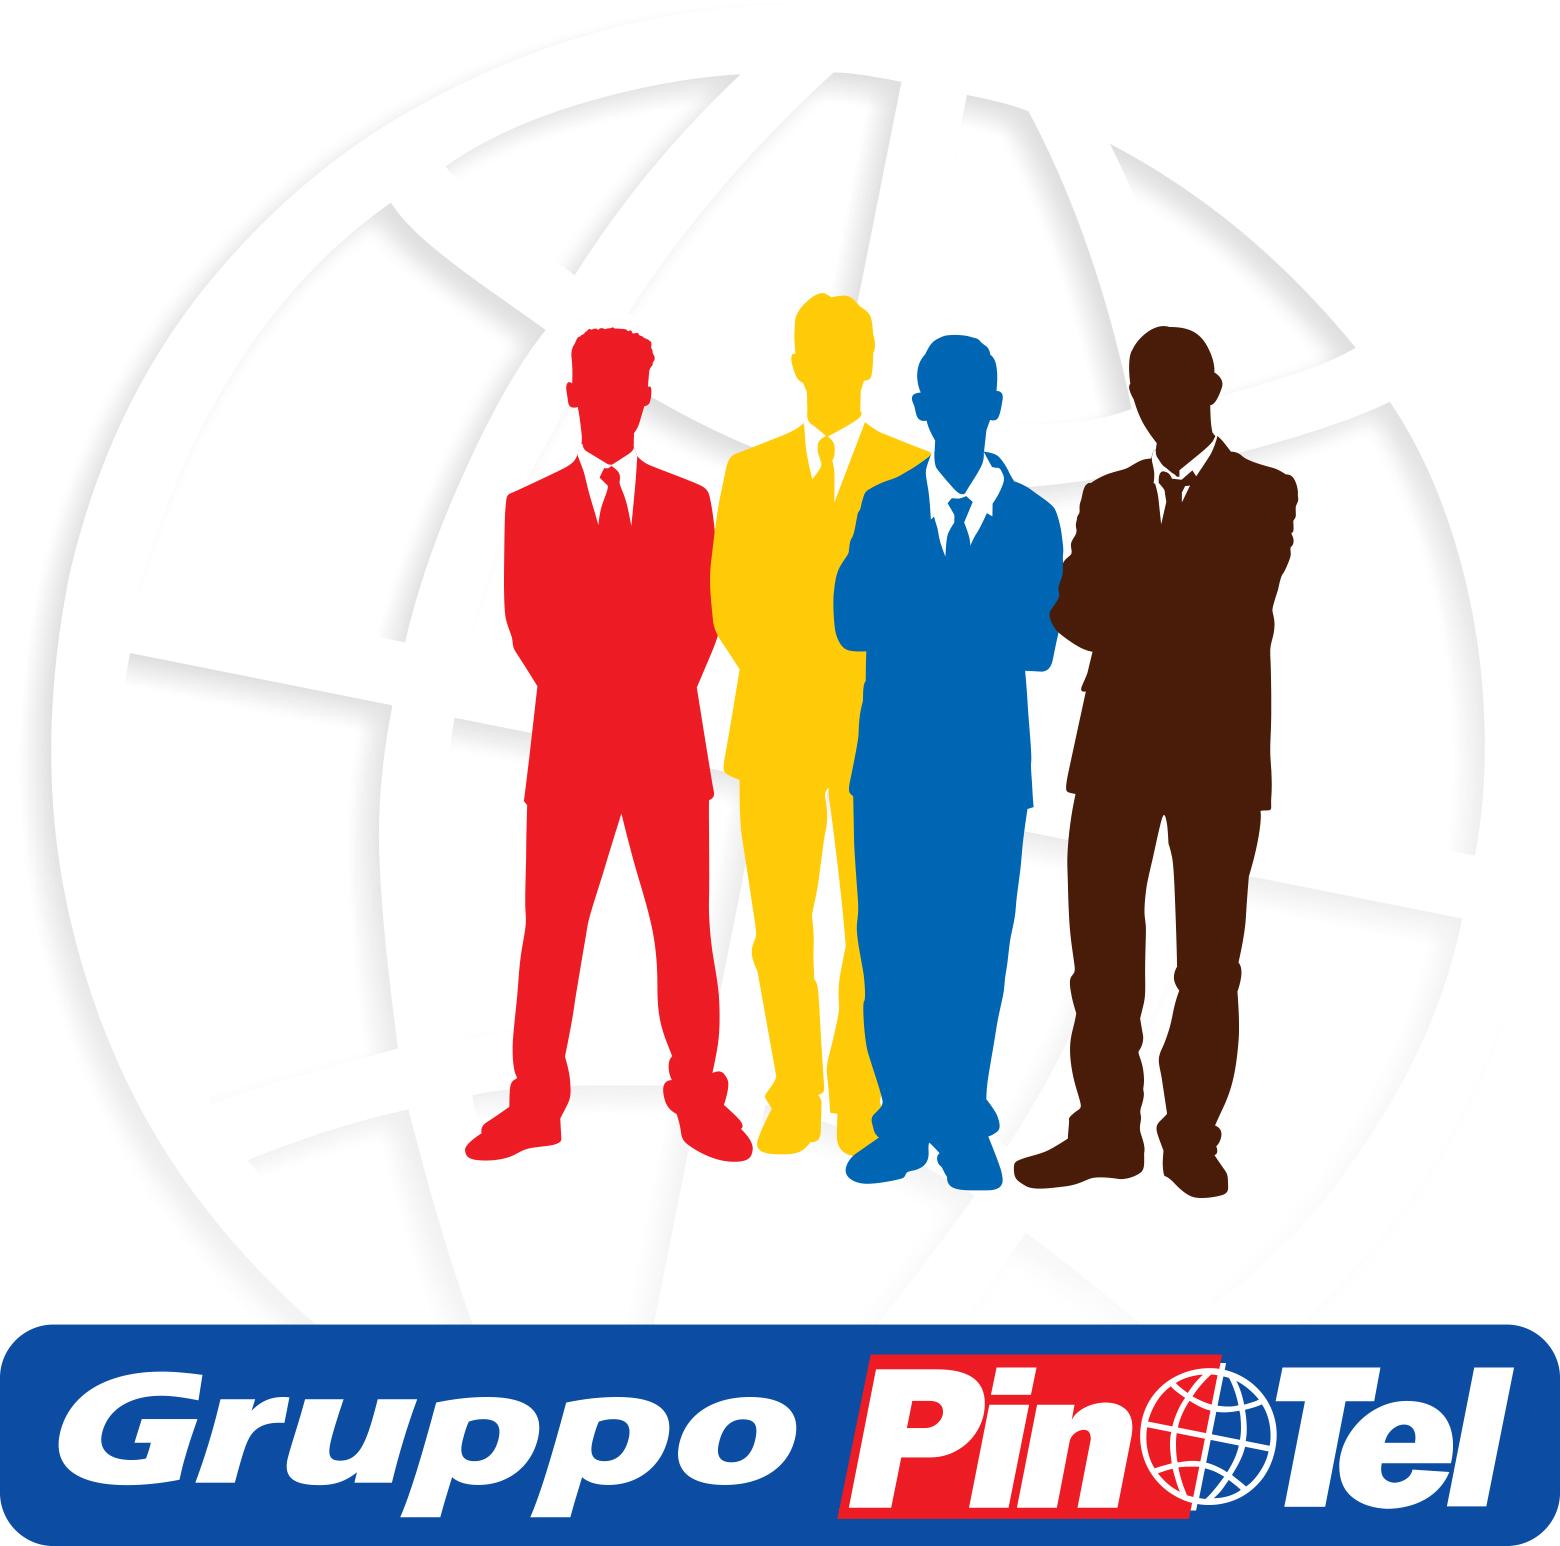 Gruppo Pintel